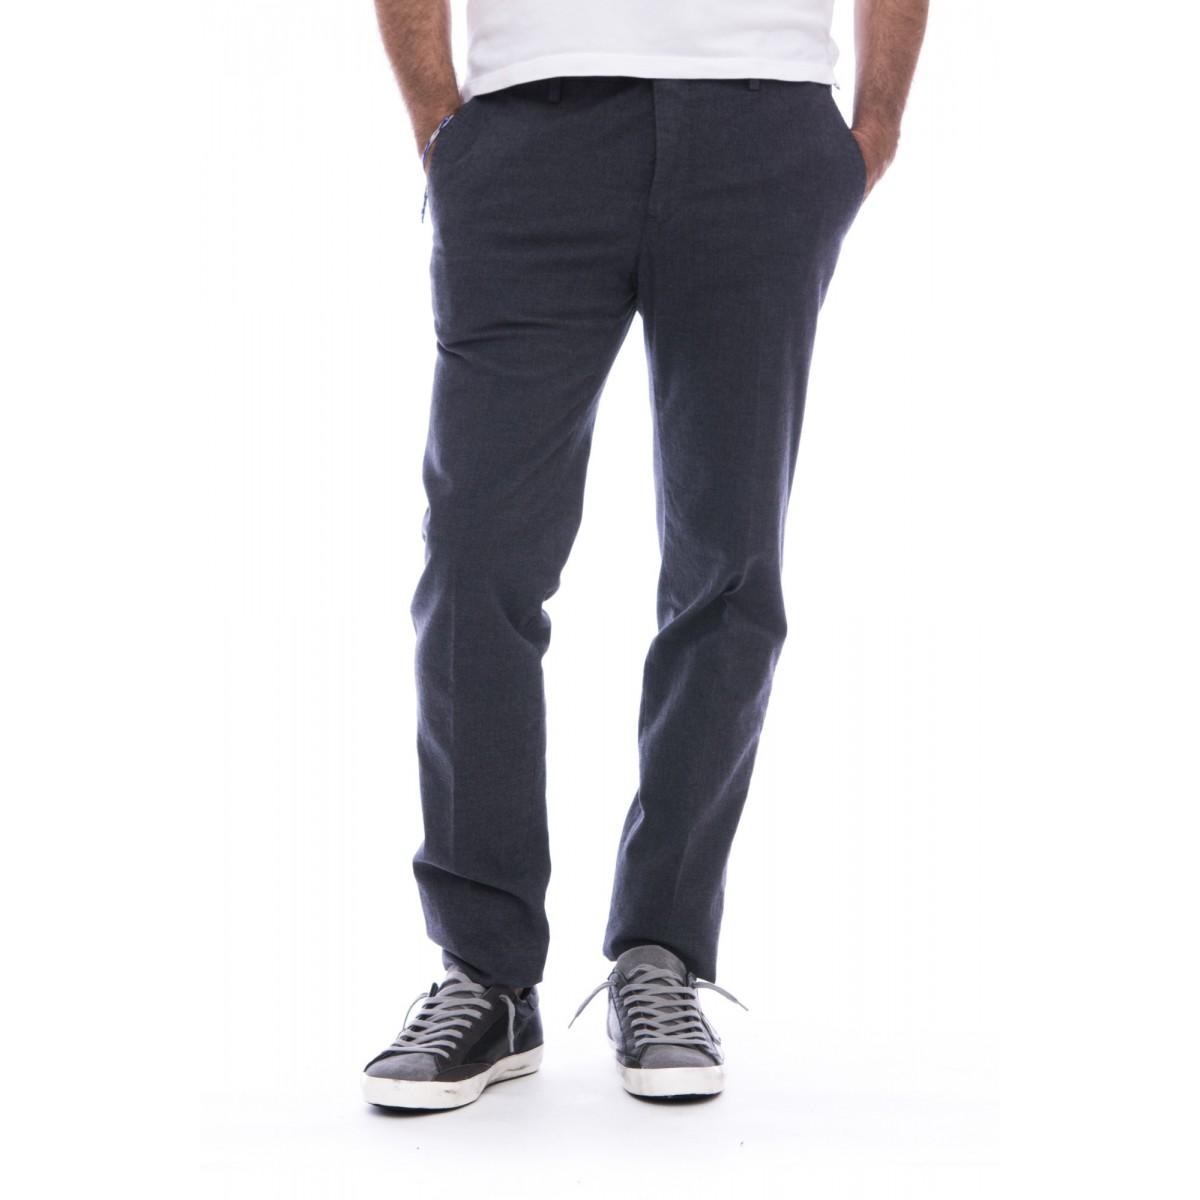 Pantalone uomo Pt 01 - Cpd501 mp11 microfantasia strech